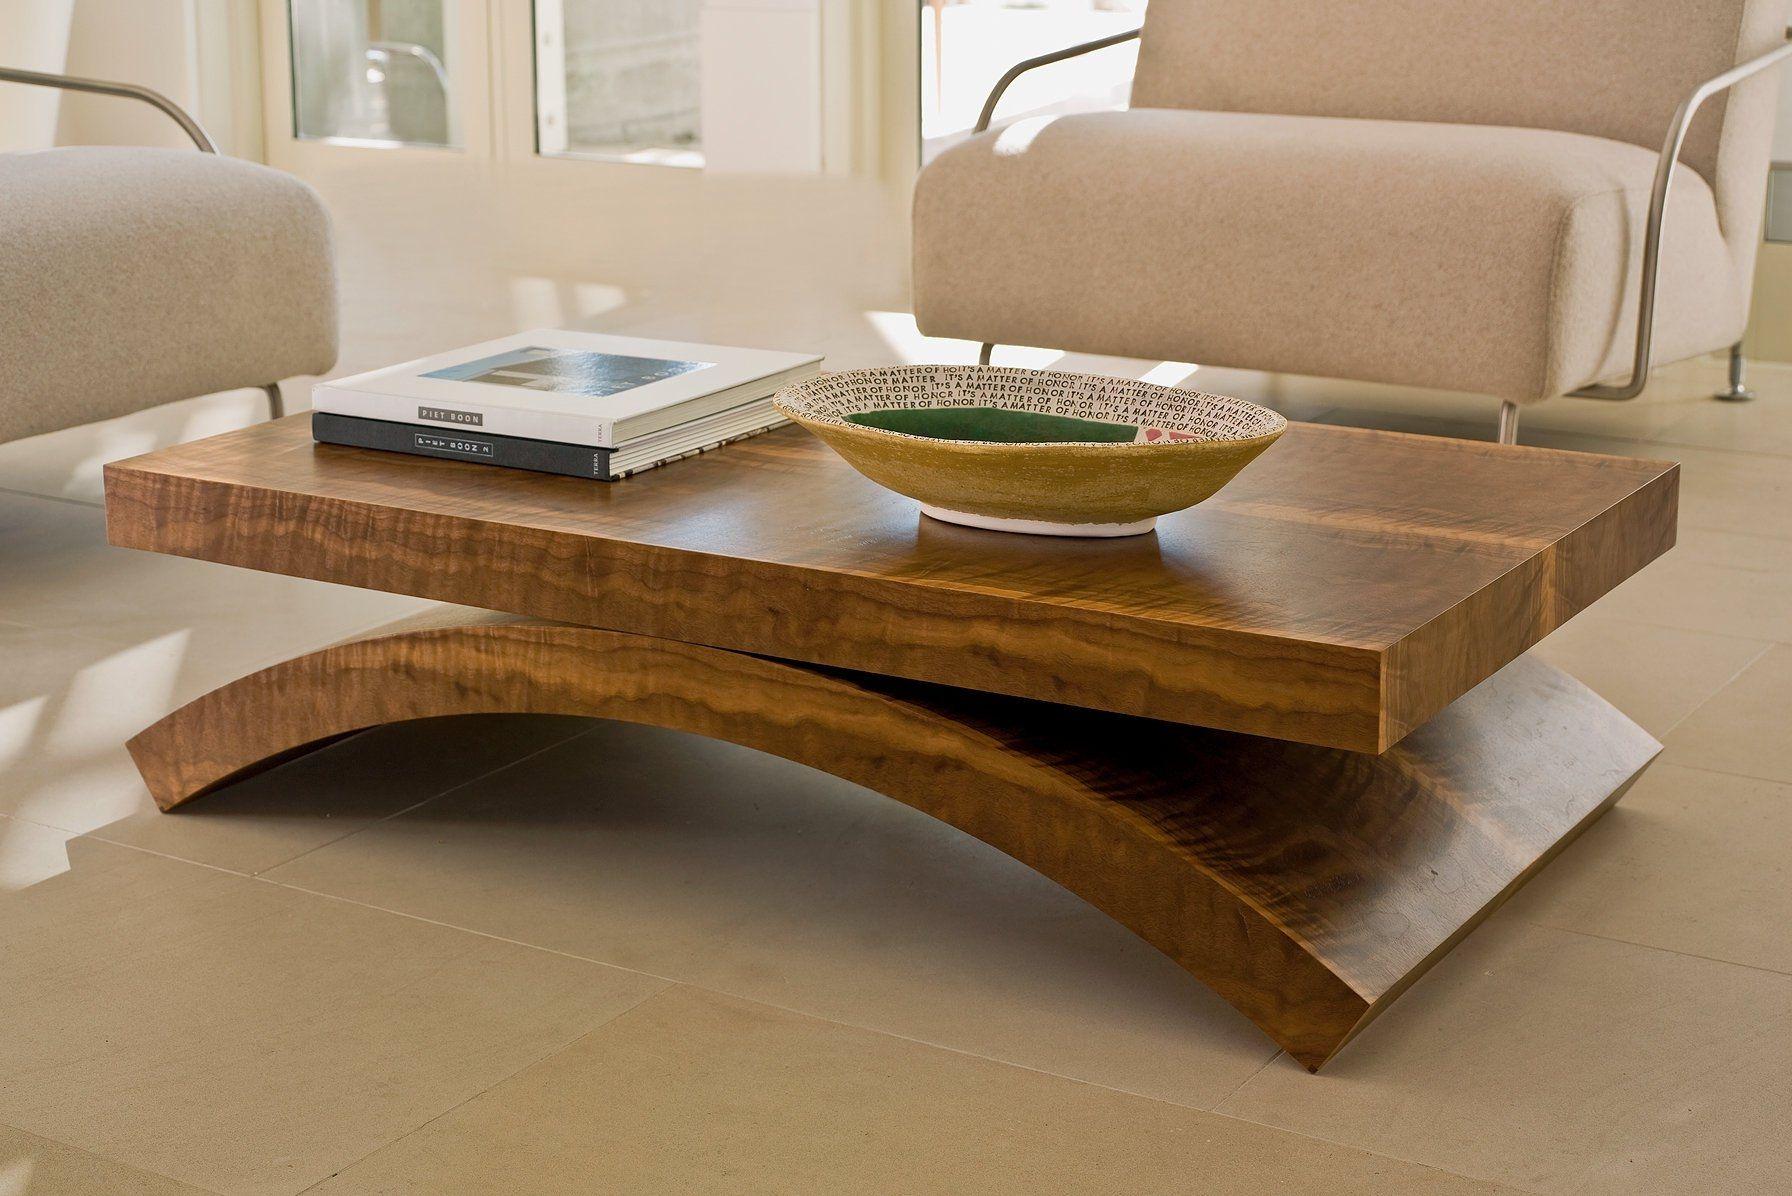 43e66a7fb32b3ed77505ec1a4c8542e1 Impressionnant De Table Transformable Concept